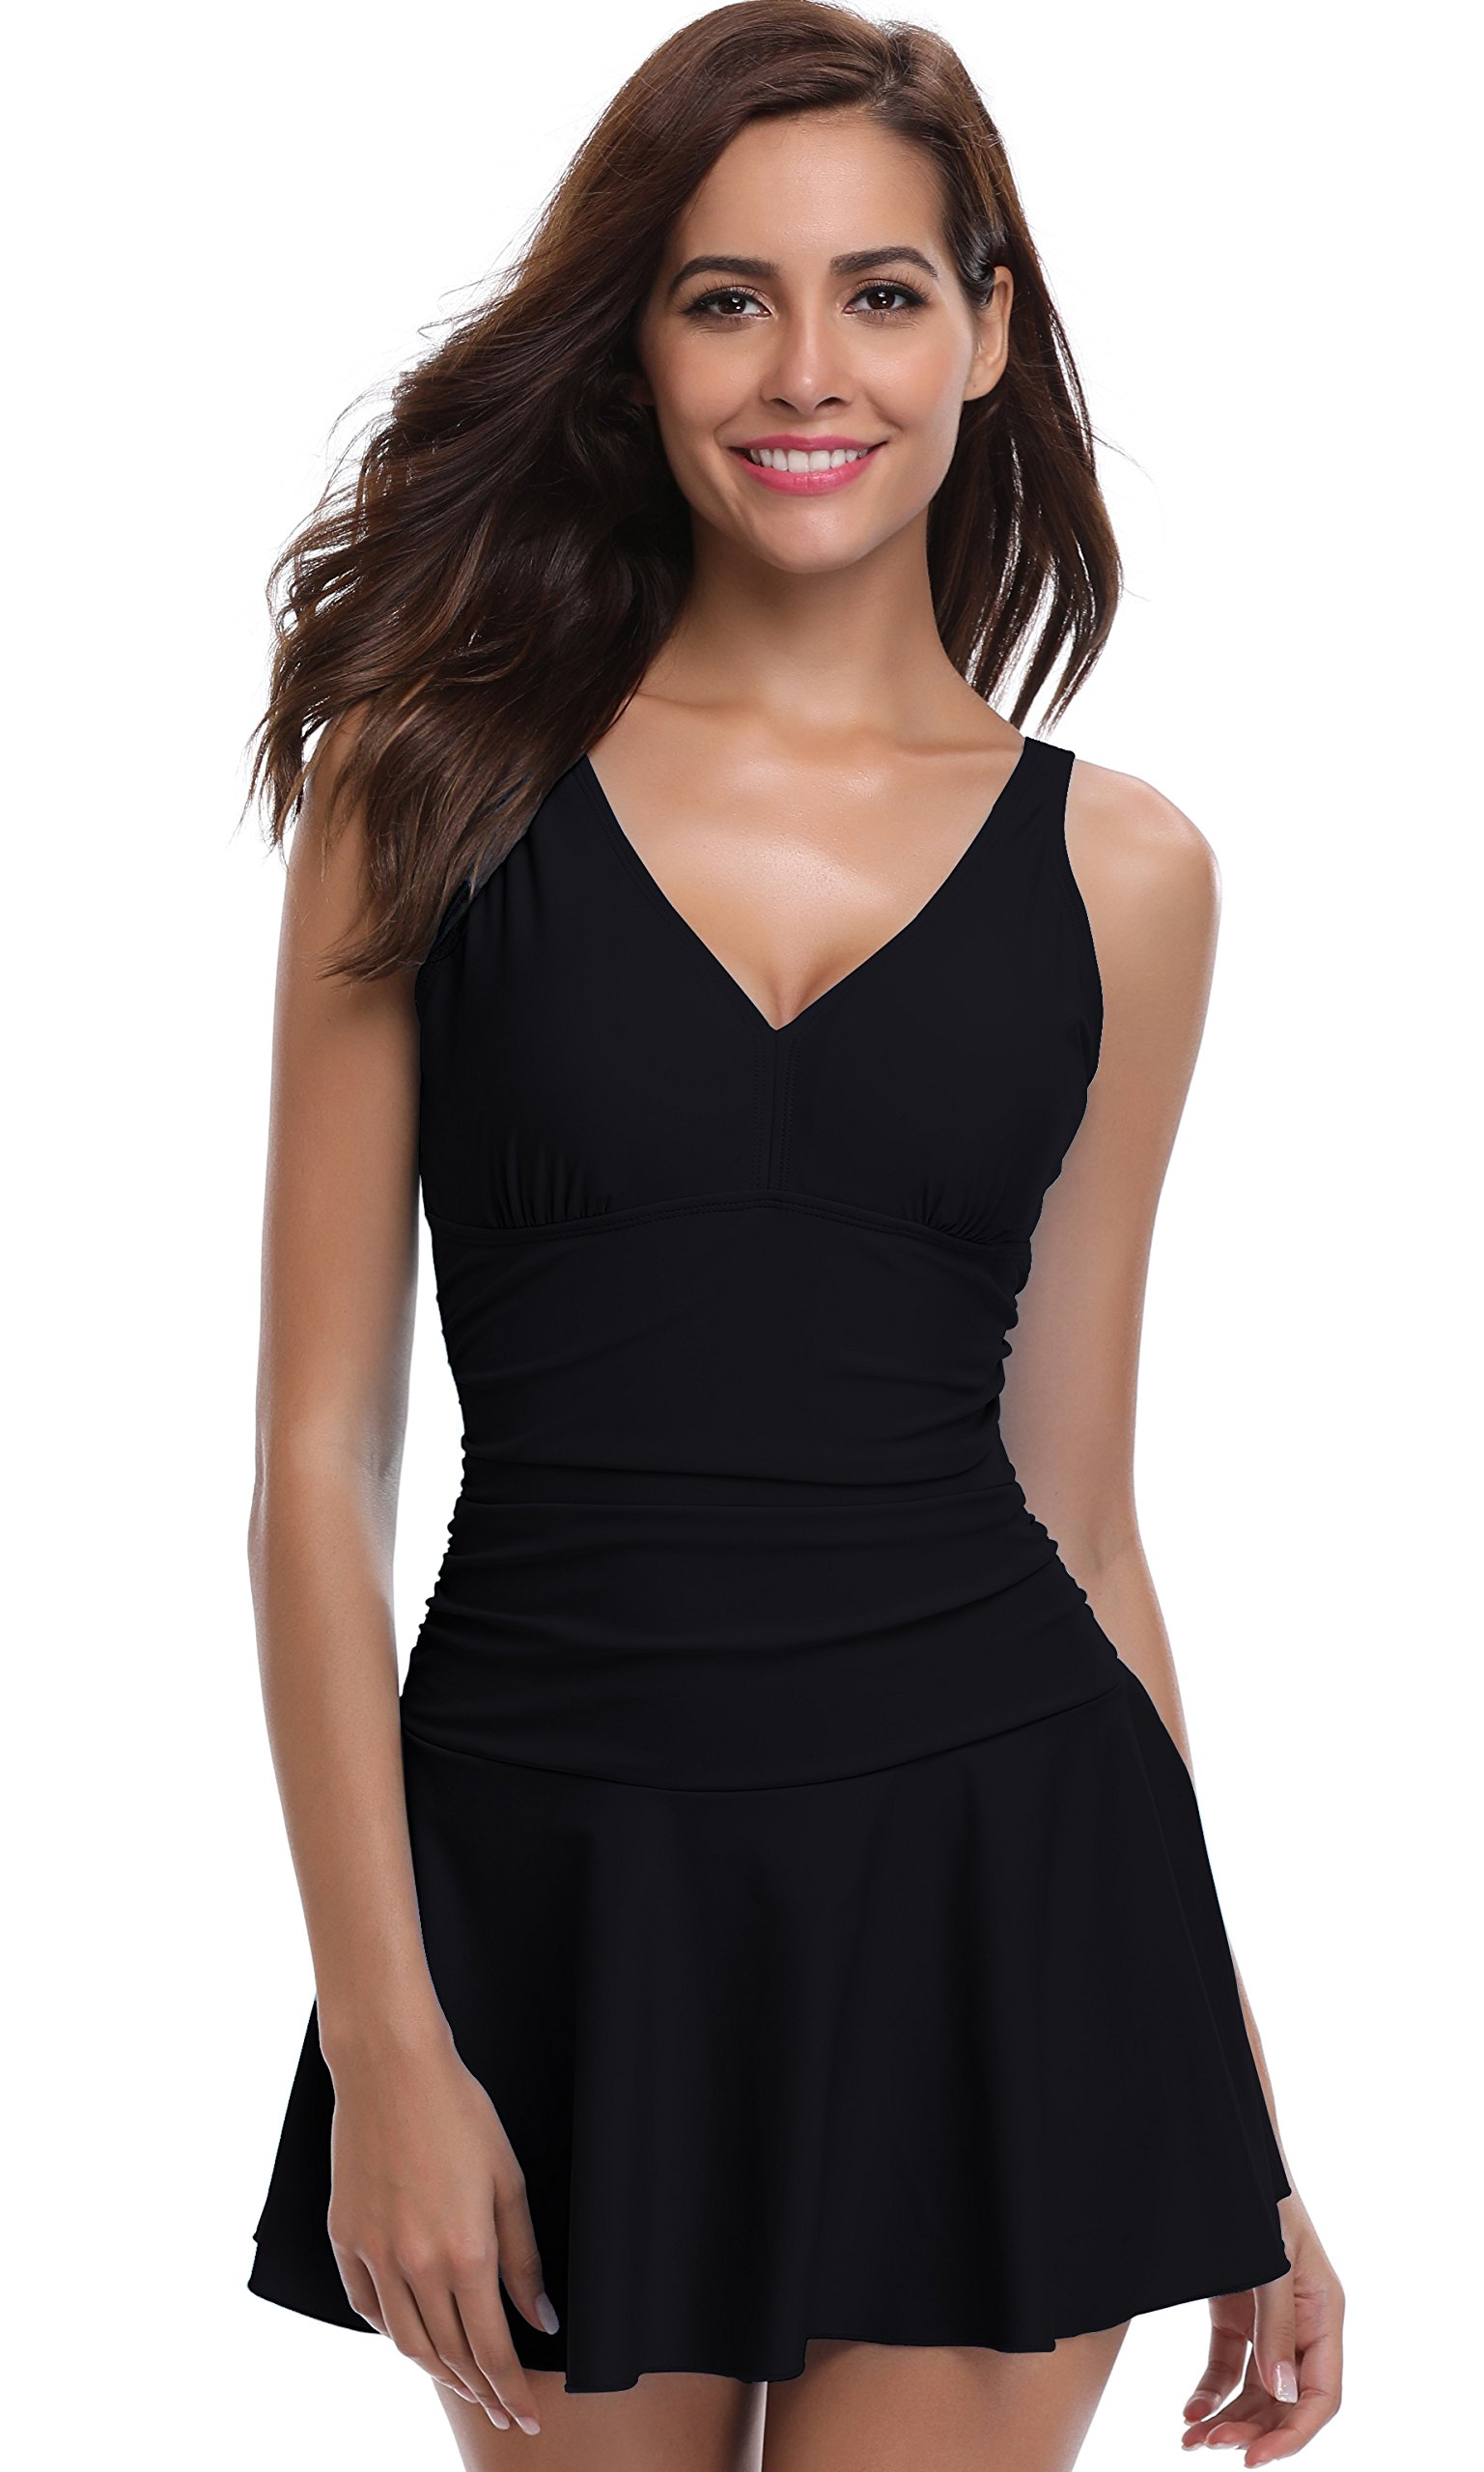 SHEKINI Women's One Piece Skirt Swimsuit Ruched Retro Swimdress Bathing Suit (Small, Manhattan Black)